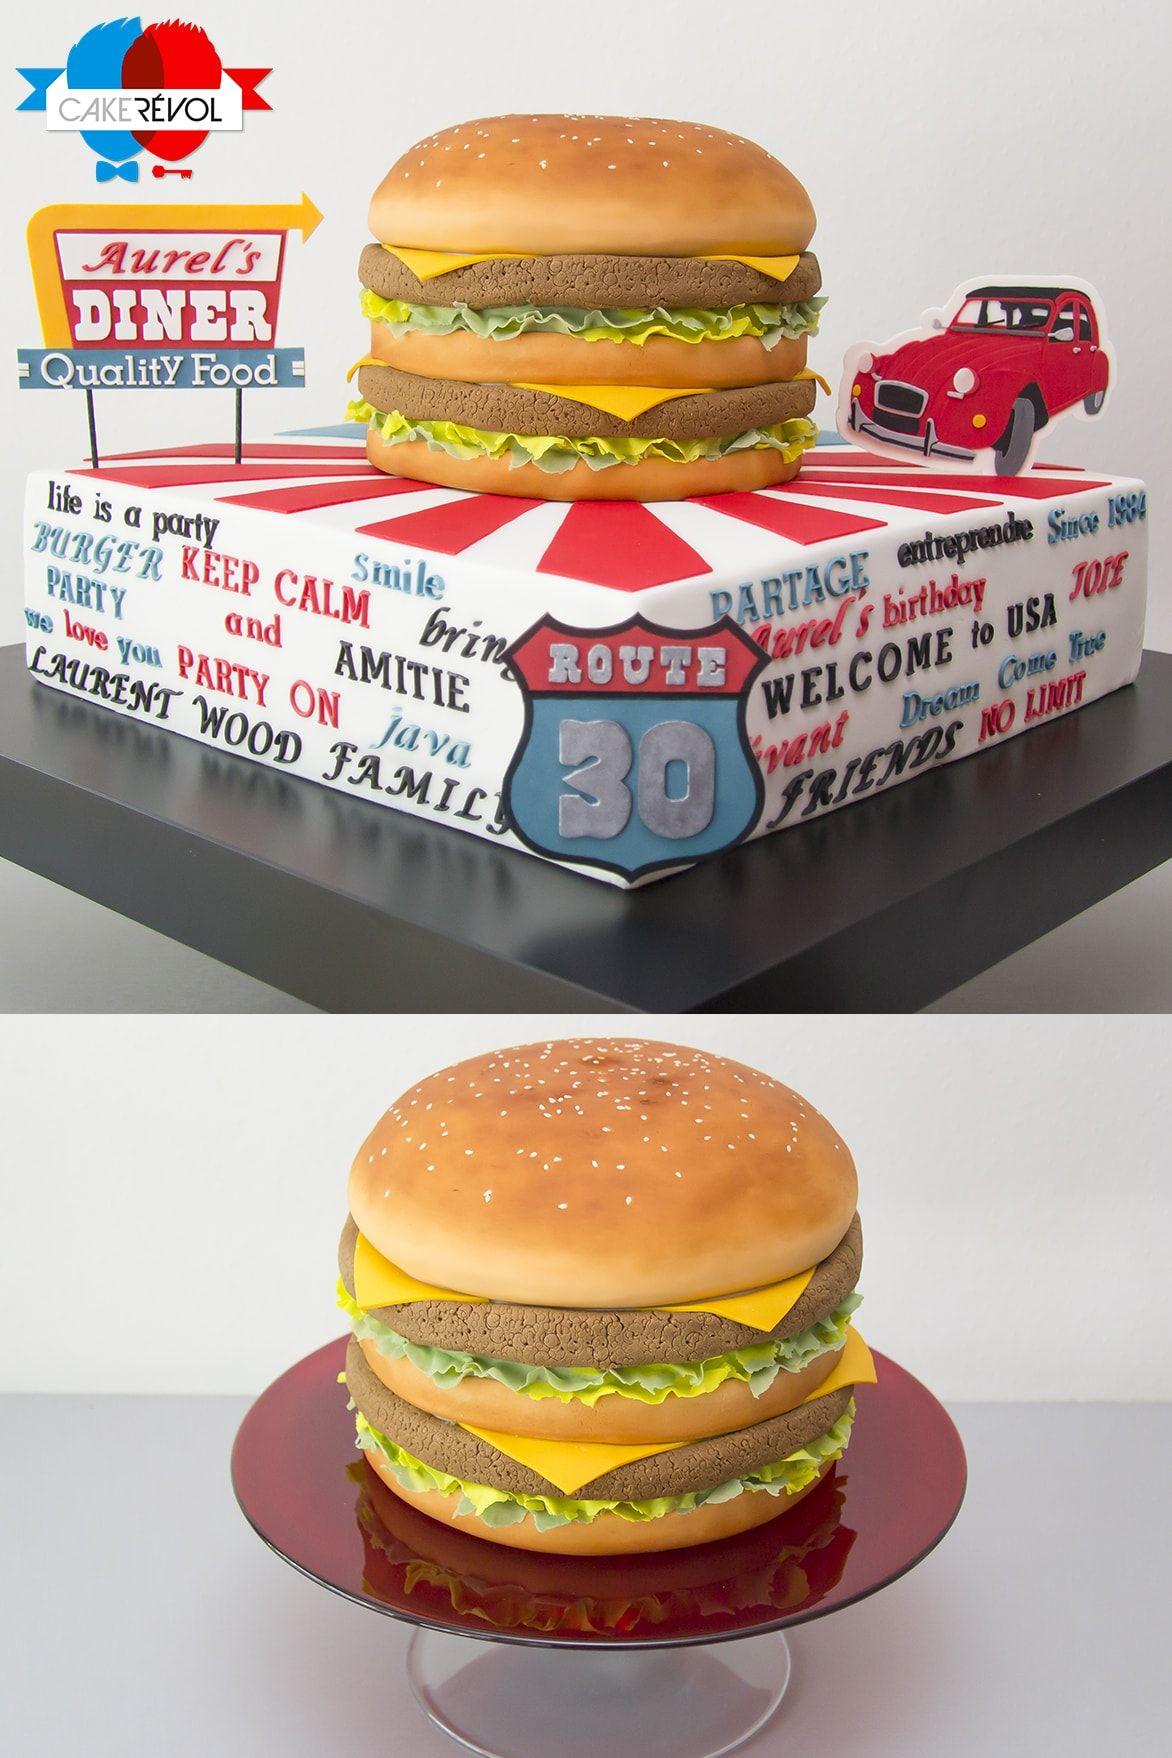 NOS CRÉATIONS - American Burger - CAKE RÉVOL - Cake Design - Nantes